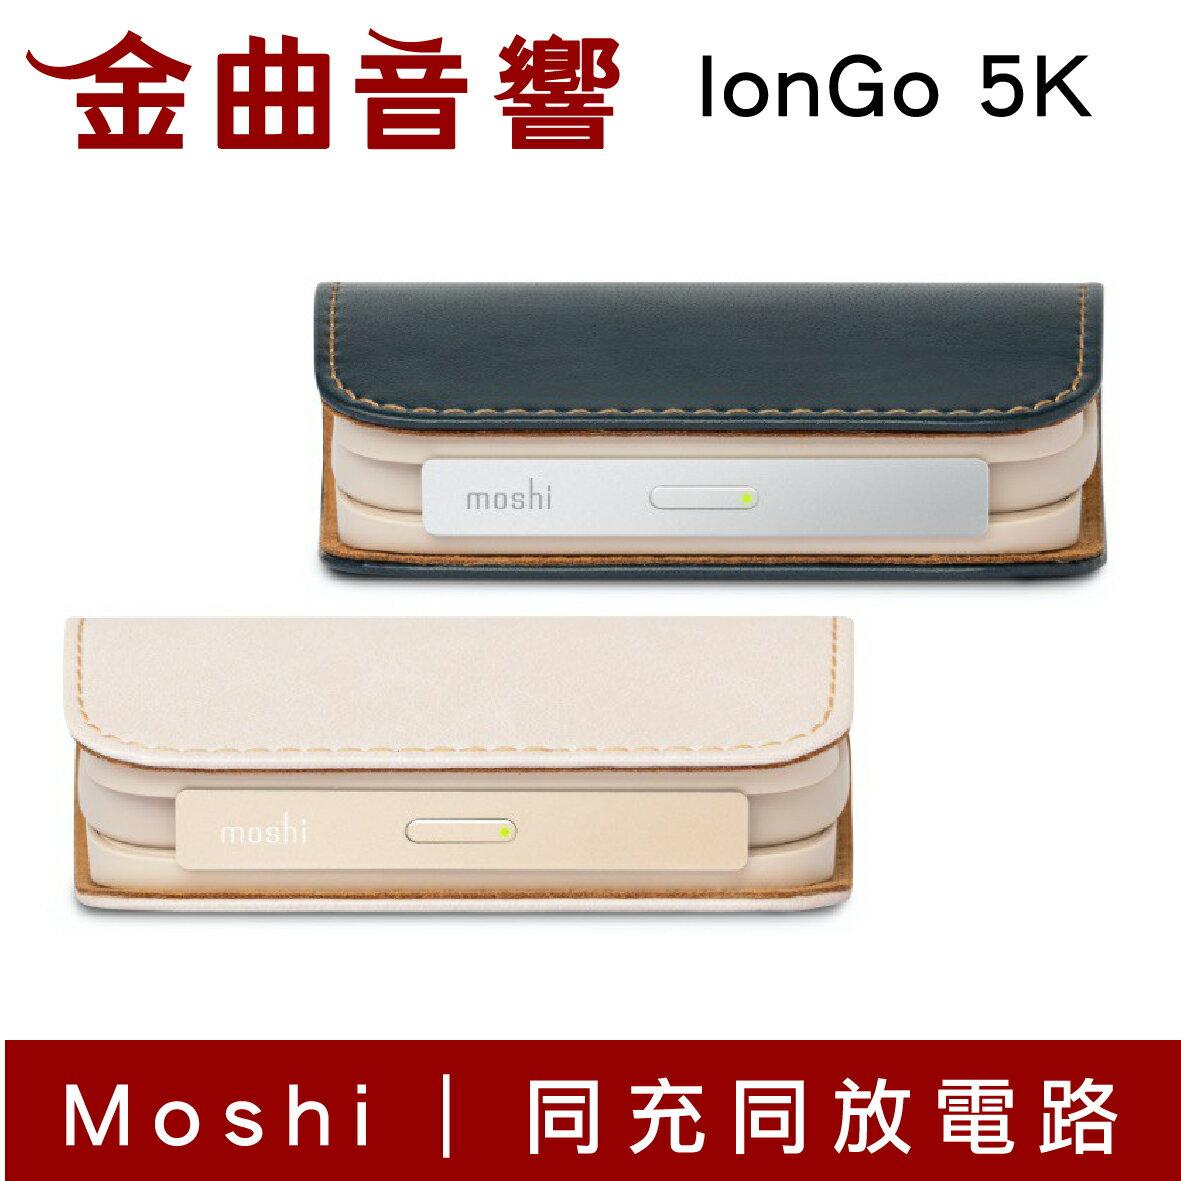 Moshi IonGo 5K 帶線行動電源 (USB 及 Lightning,iPhone 充電專用)   金曲音響